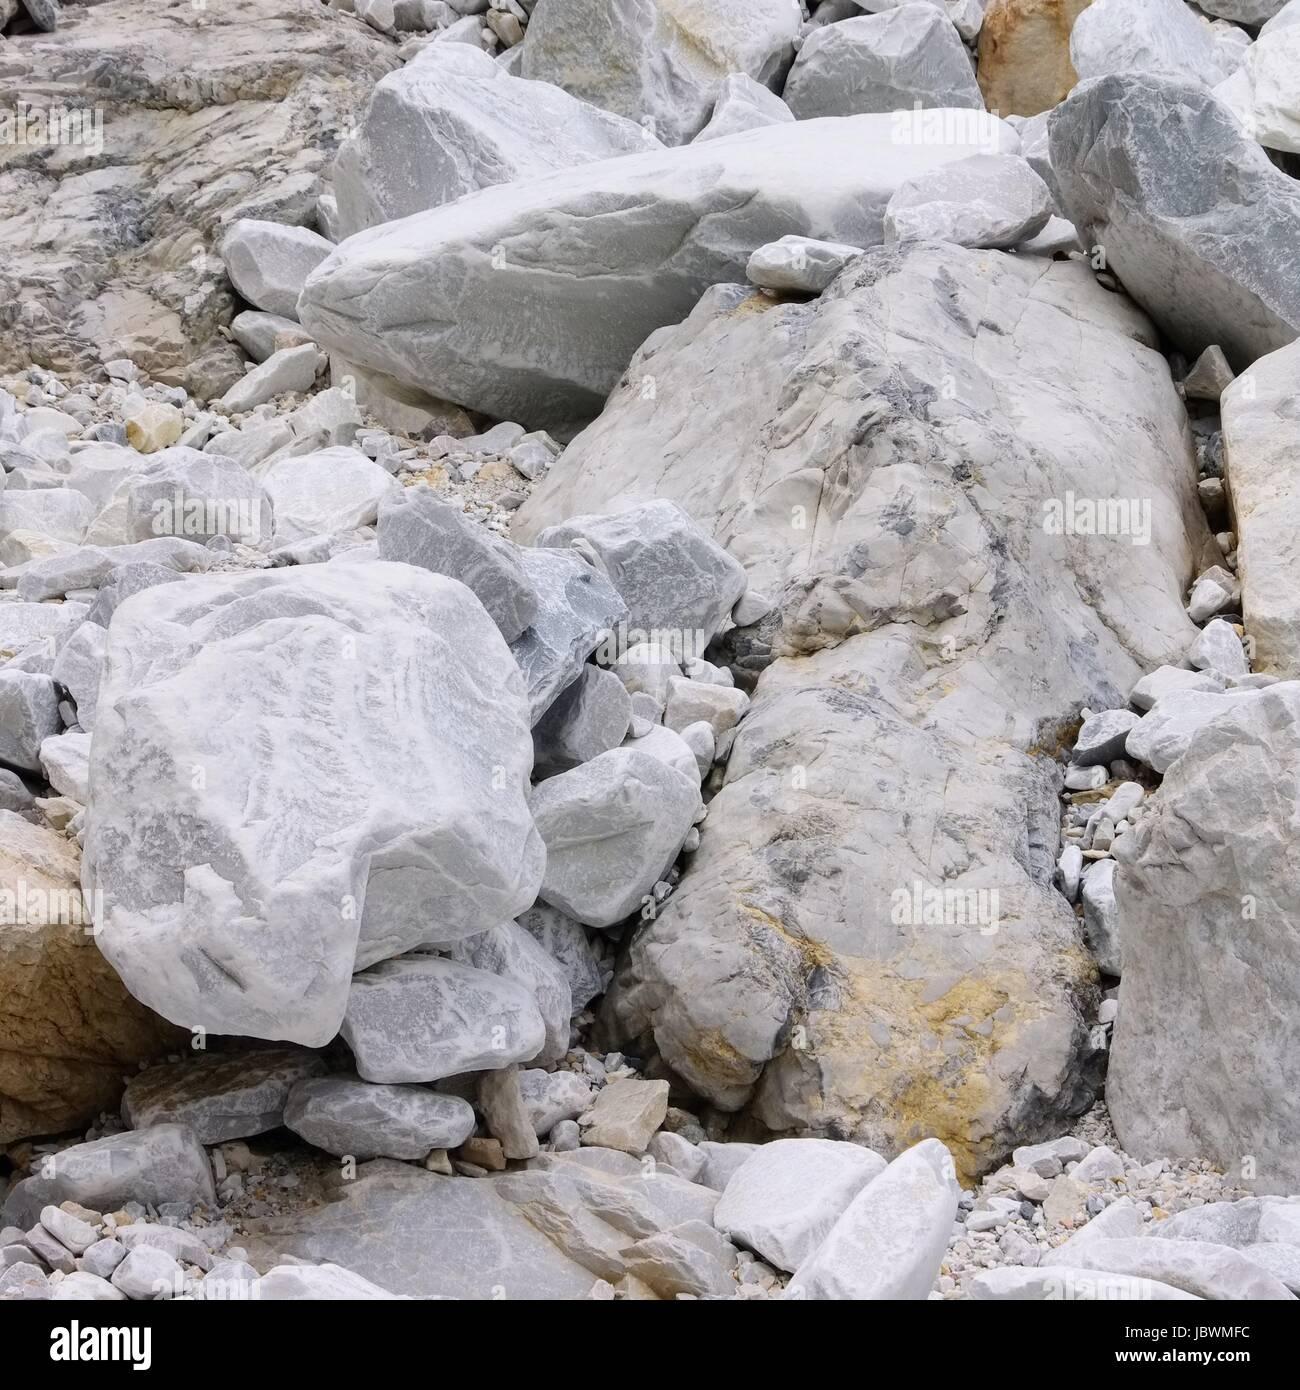 Carrara Marmor carrara marmor steinbruch carrara marble pit 32 stock photo